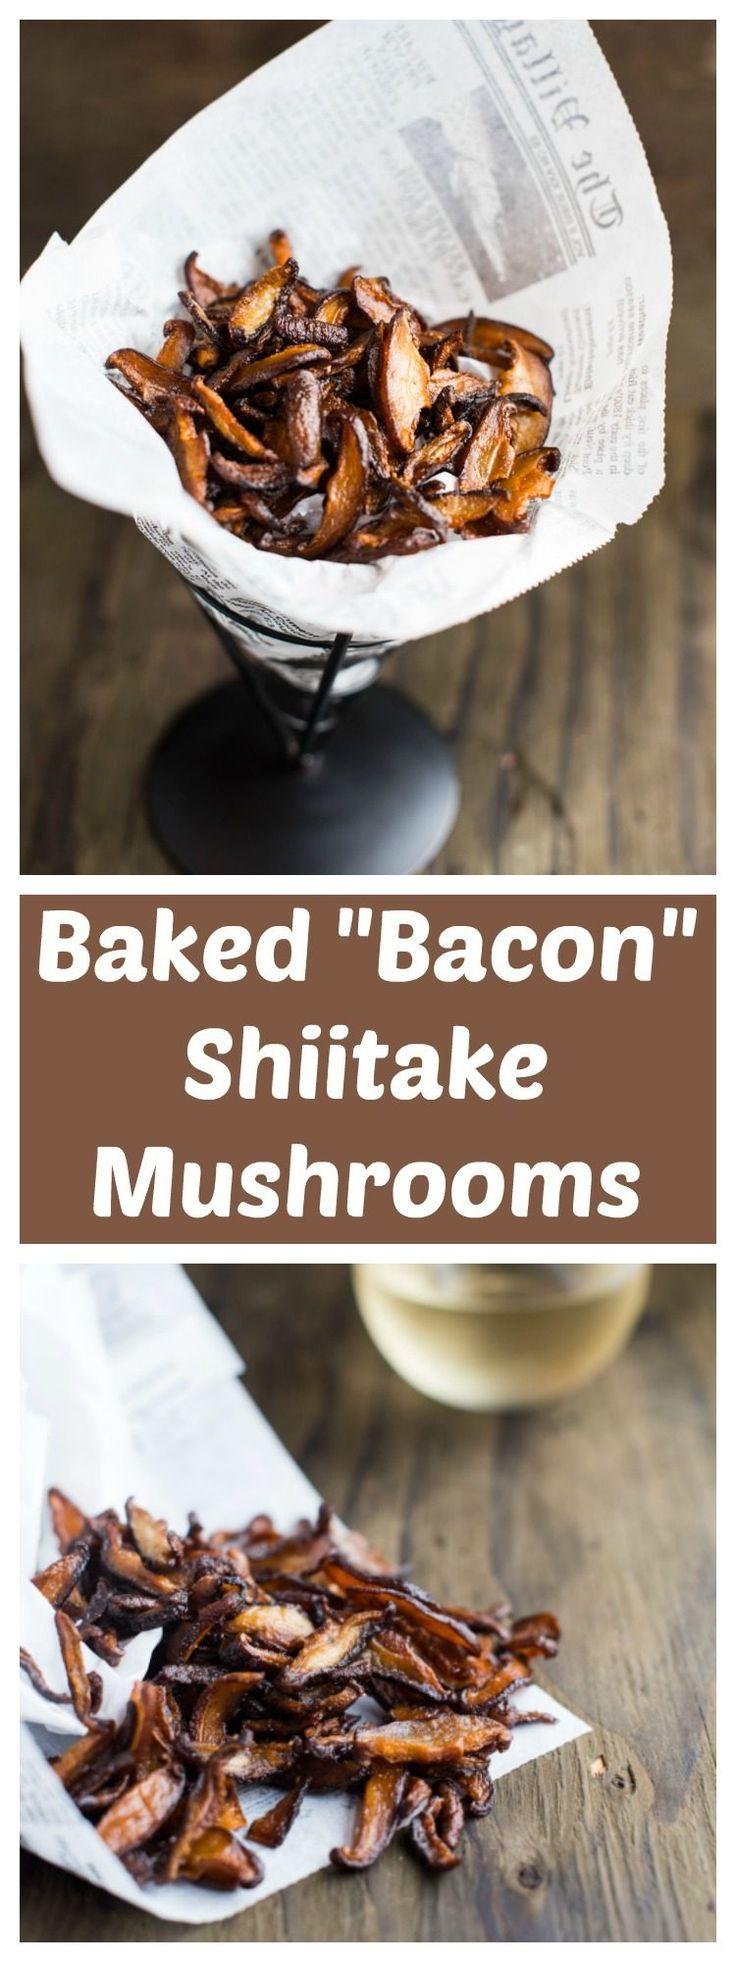 "BAKED ""BACON"" SHIITAKE MUSHROOMS"